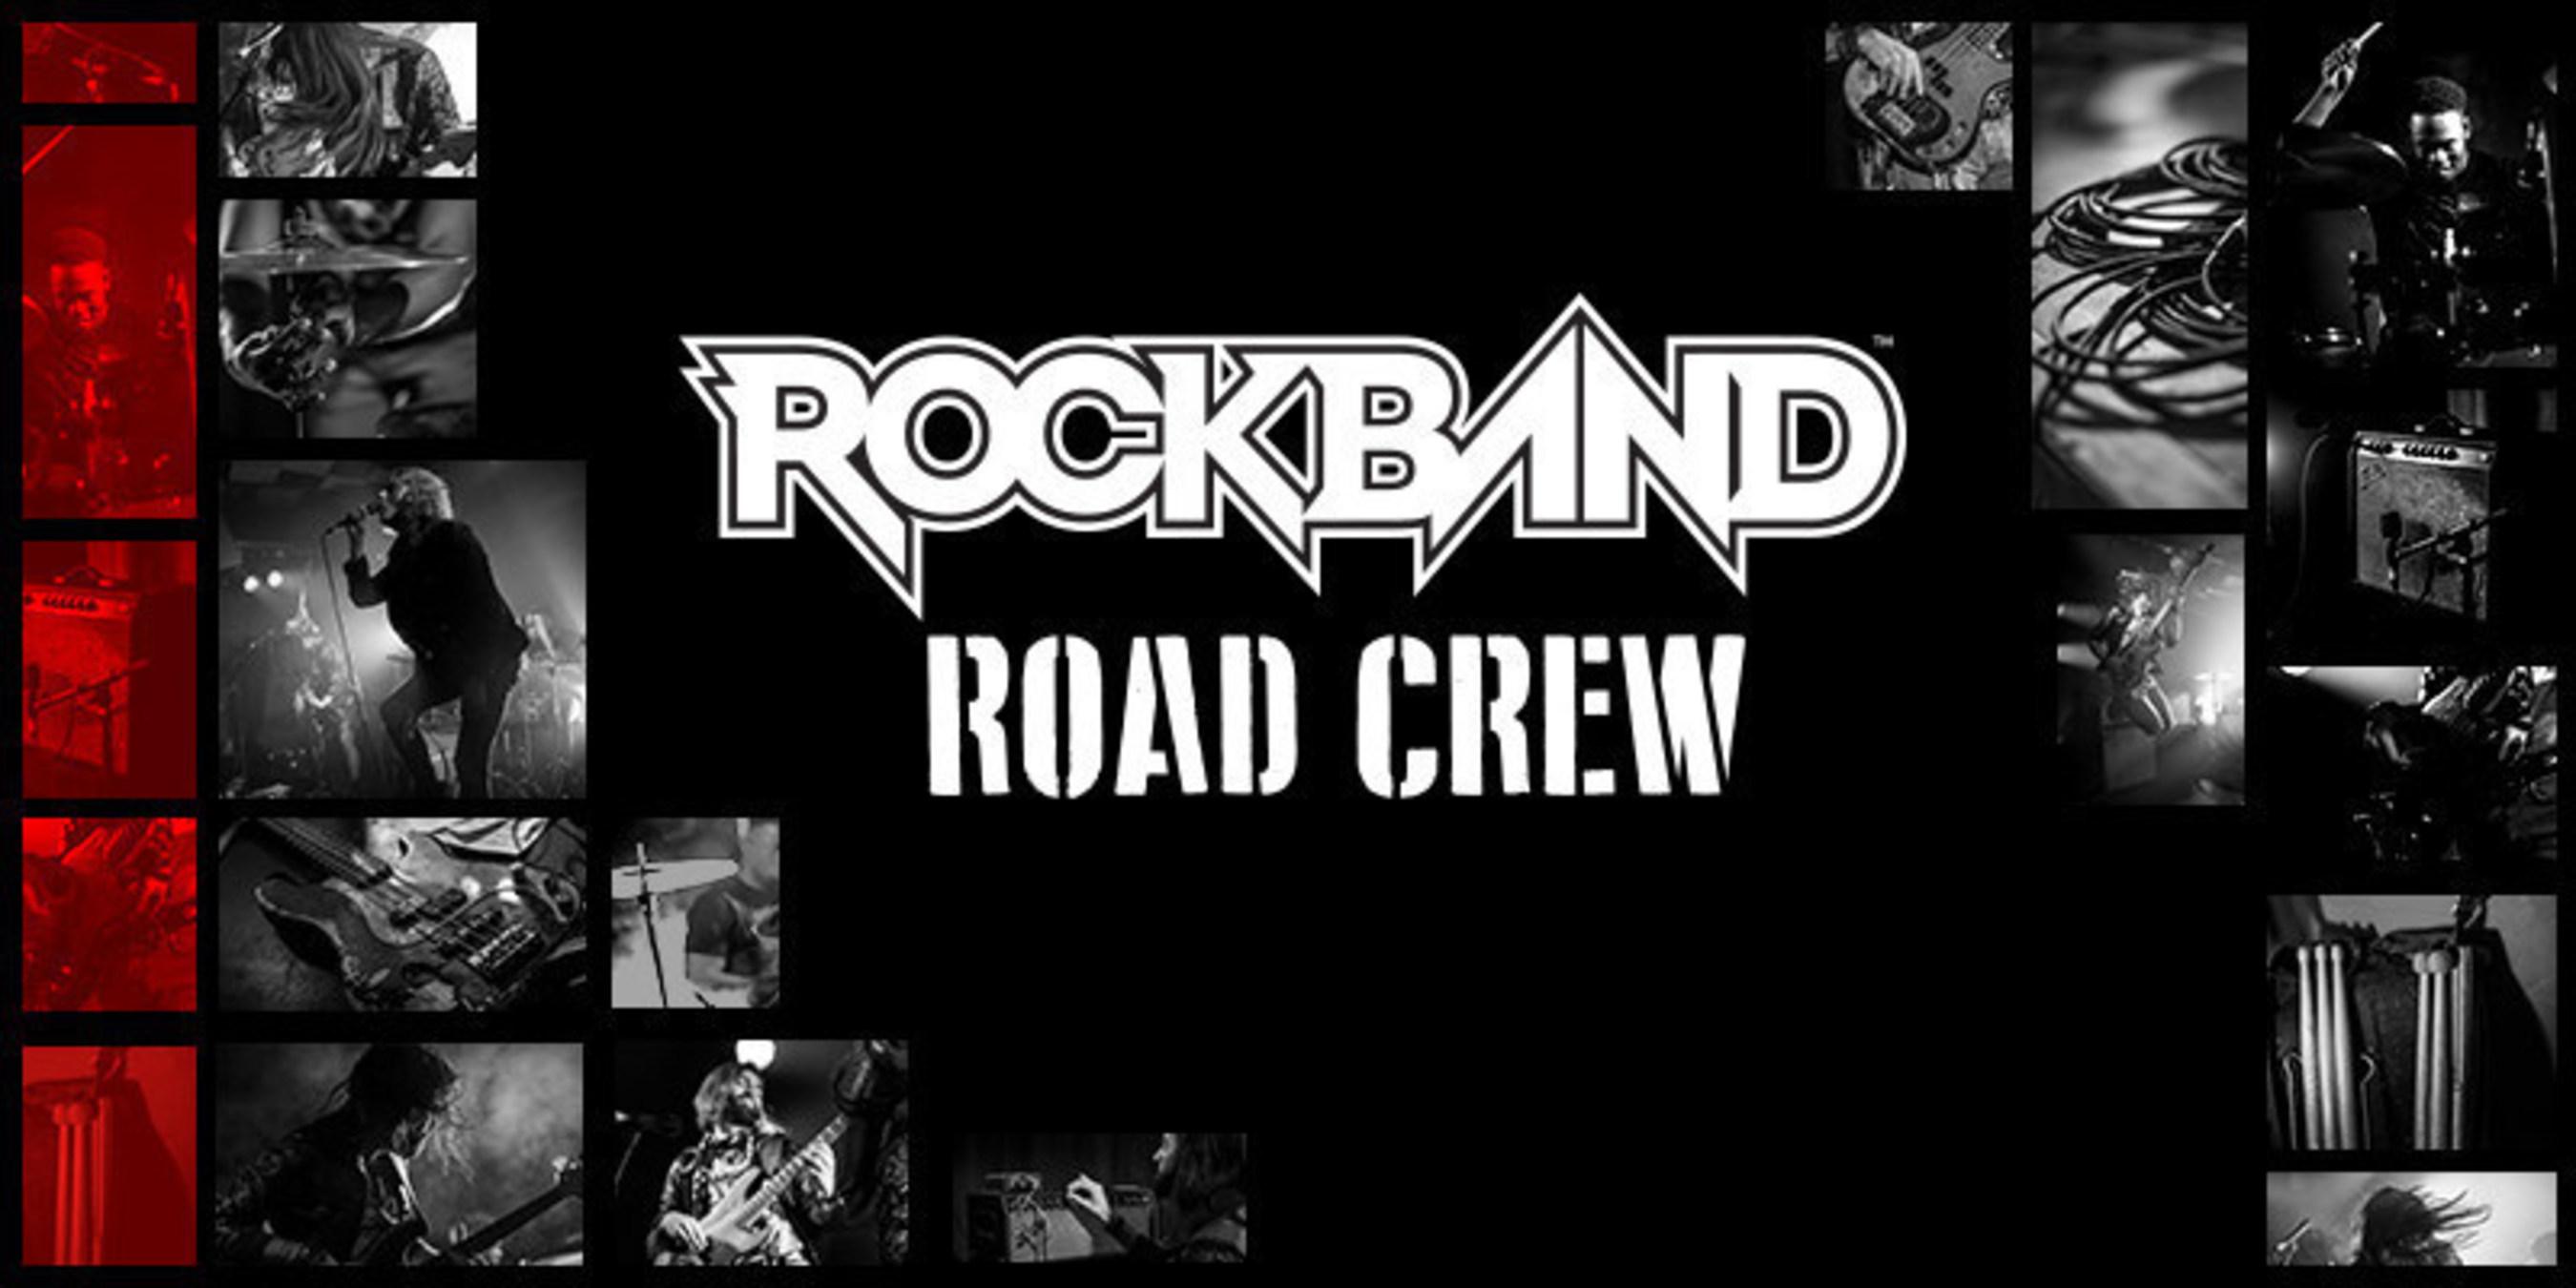 ROCK BAND 4 INTEREST, PRE-ORDERS SOAR AS HARMONIX ANNOUNCES ROCK BAND ROAD CREW PROGRAM